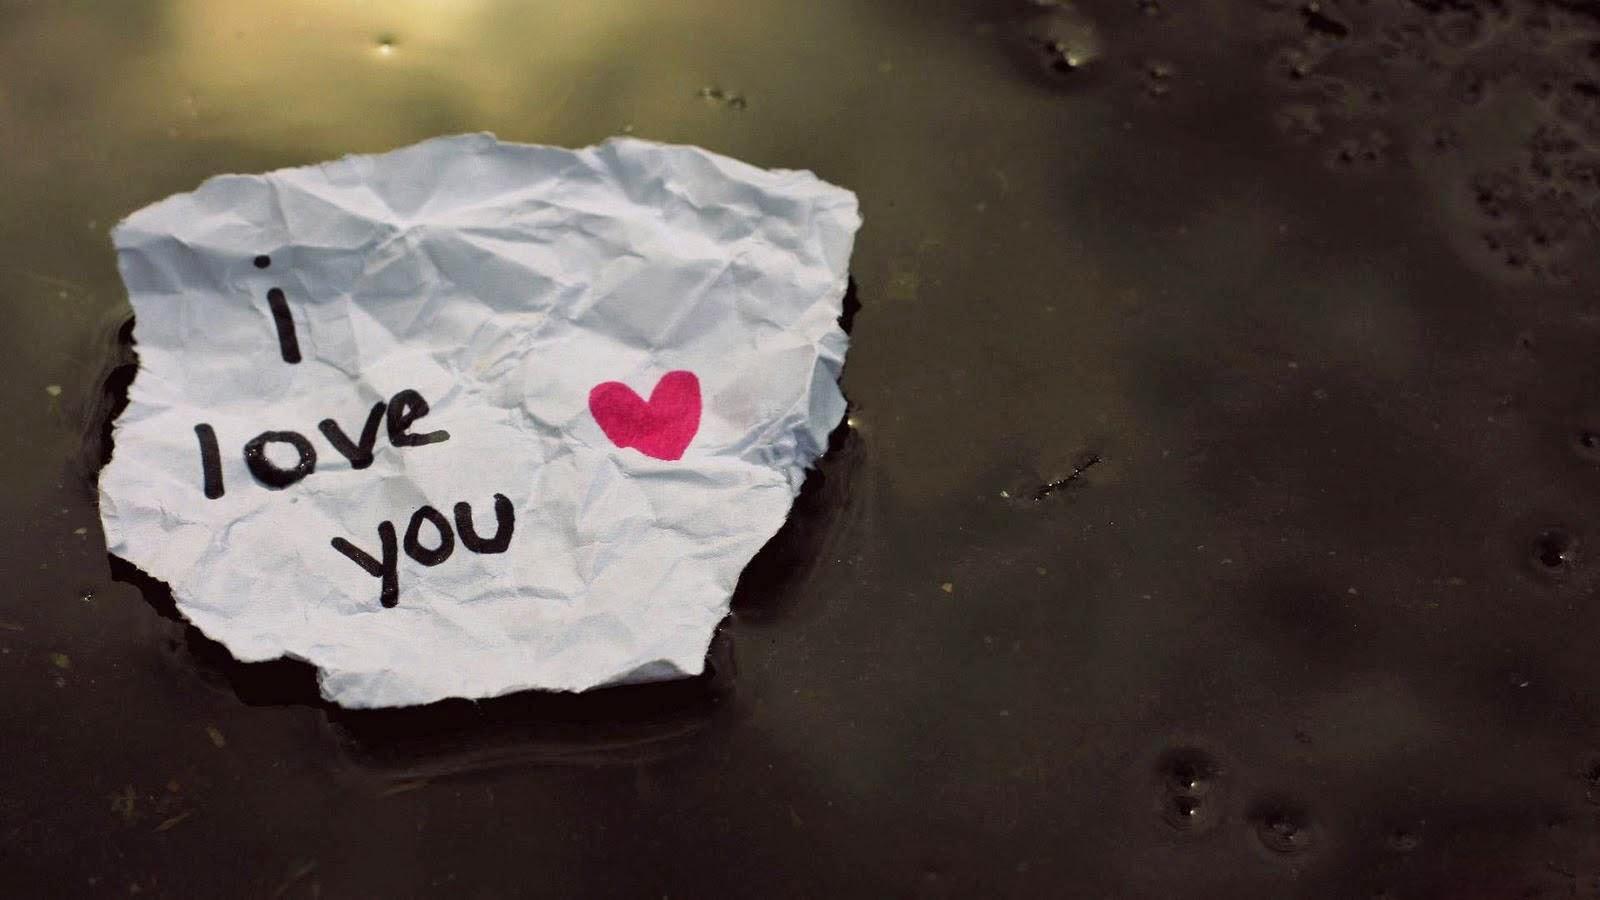 Love-nice-hd-wallpaper-free-1080p-download-for-desktop-or-laptop